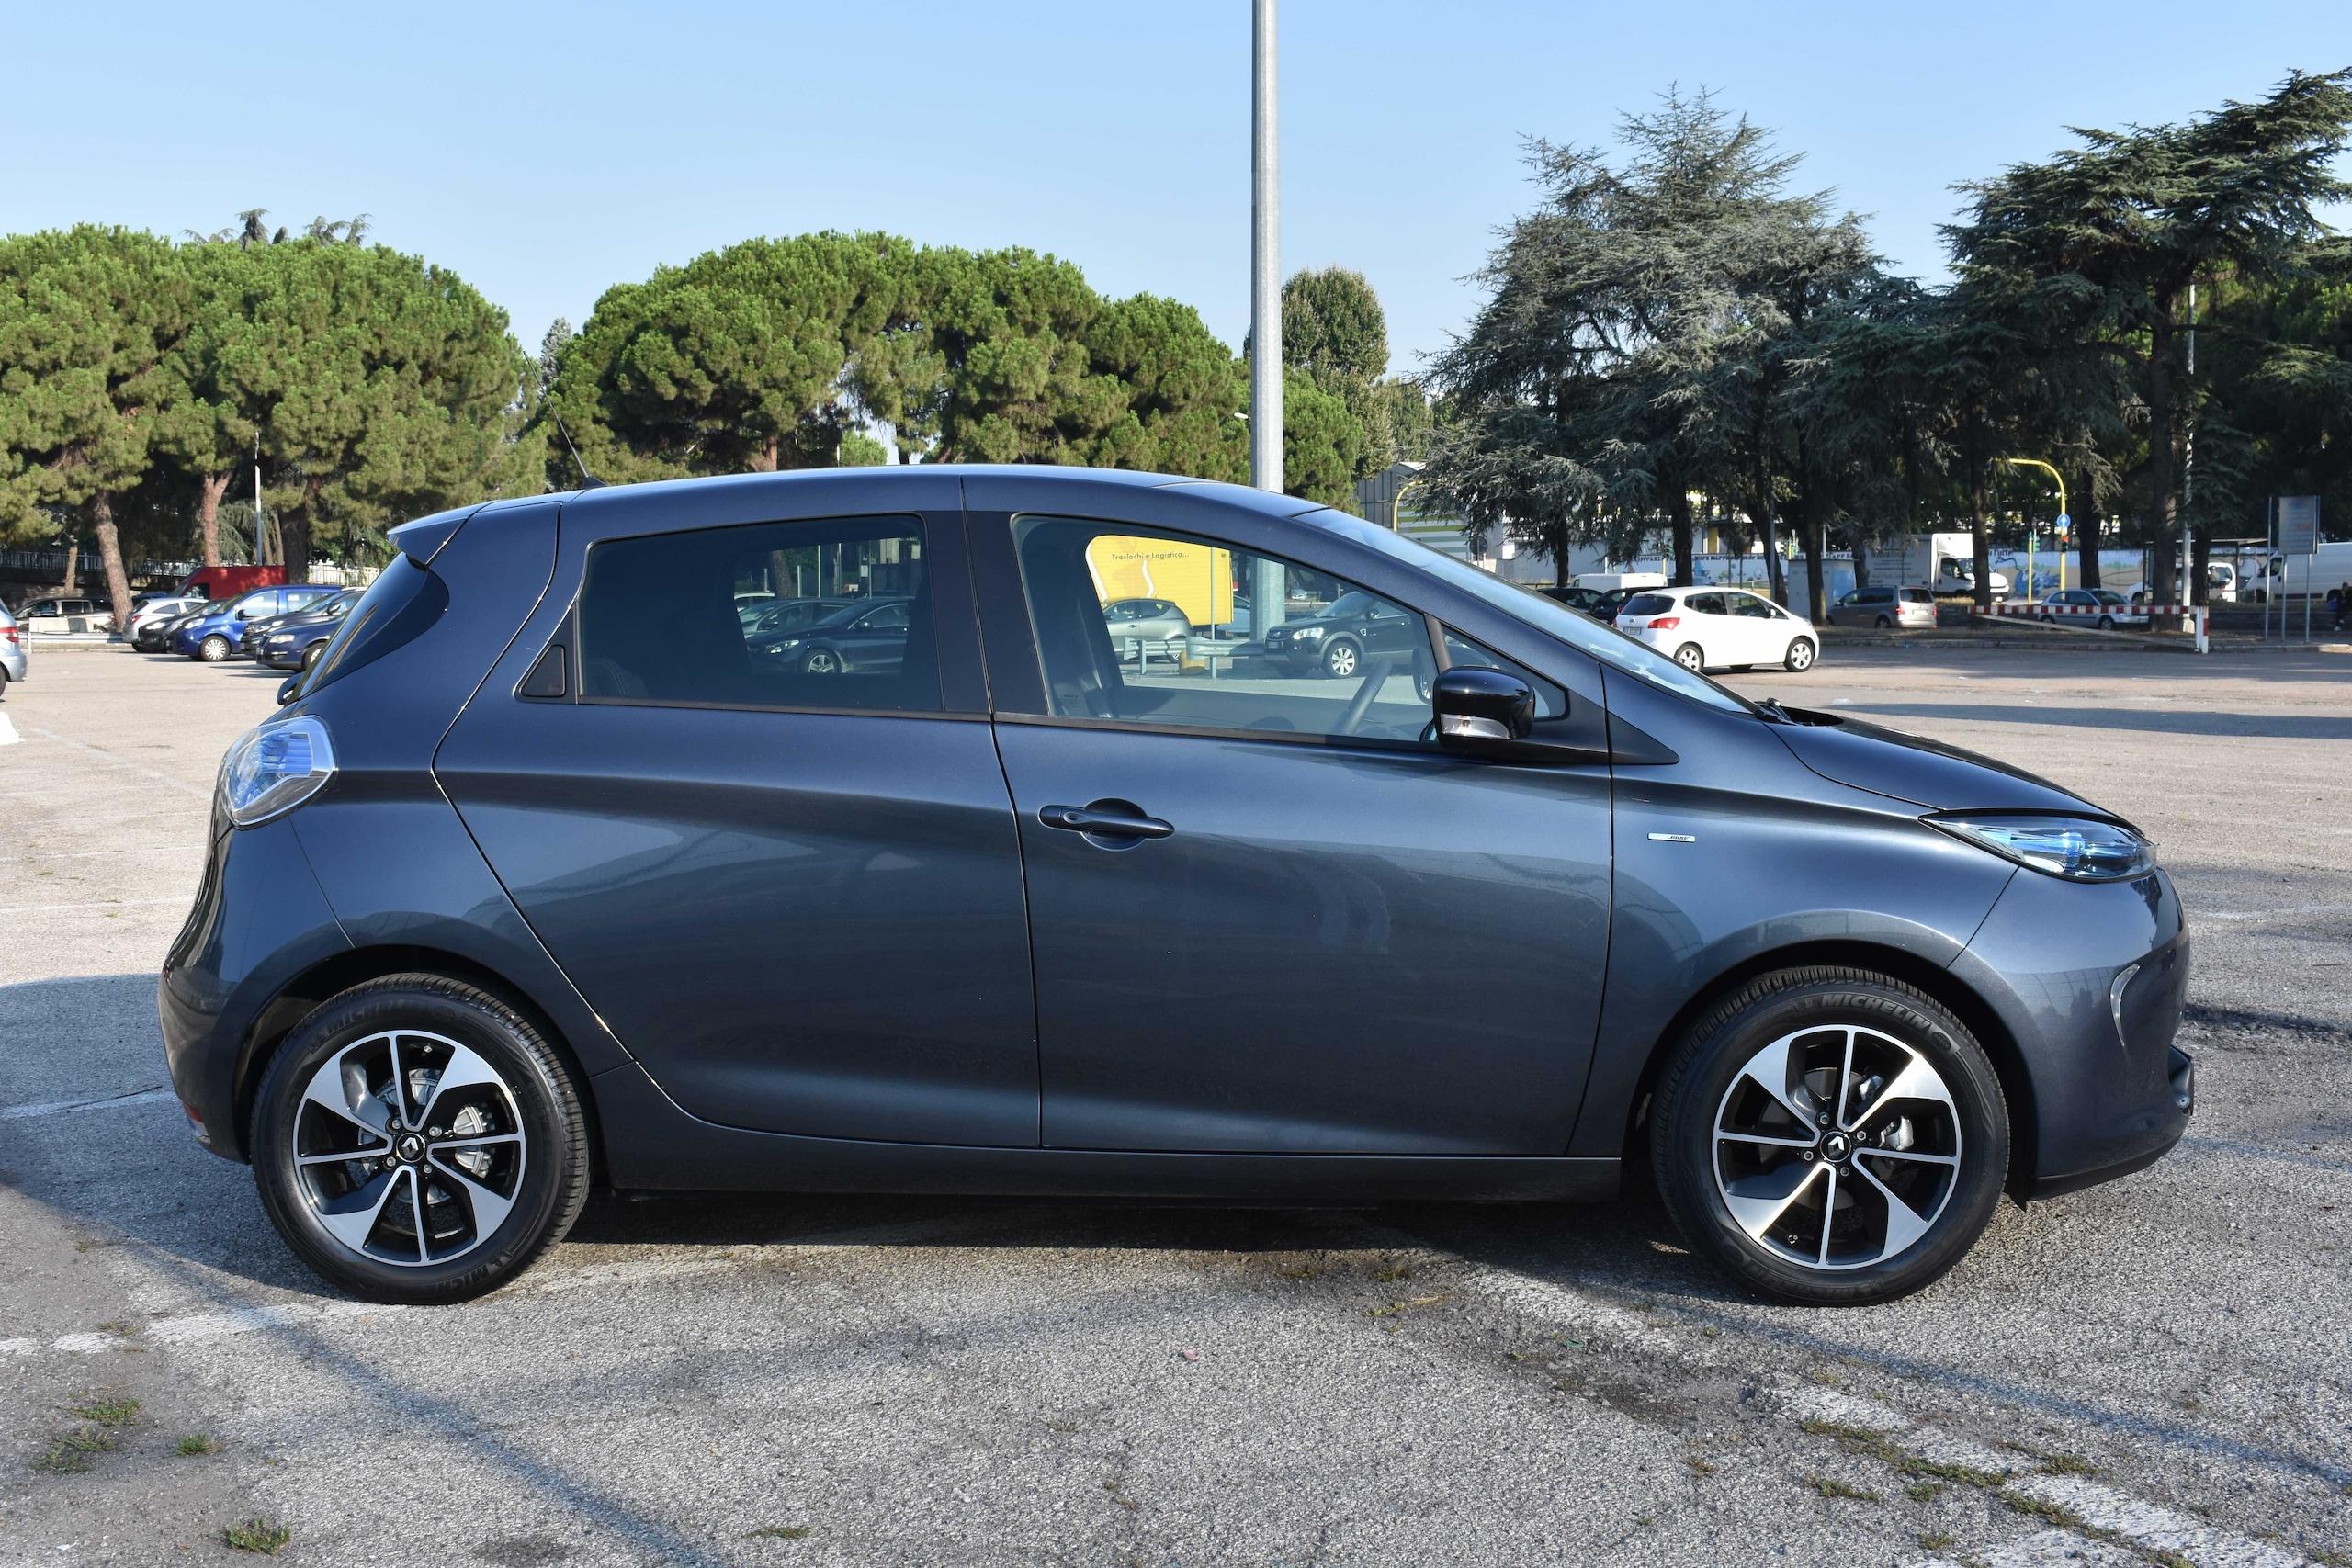 Test comparativo Citroën E-Mehari Hard Top e Renault Zoe Intens R110